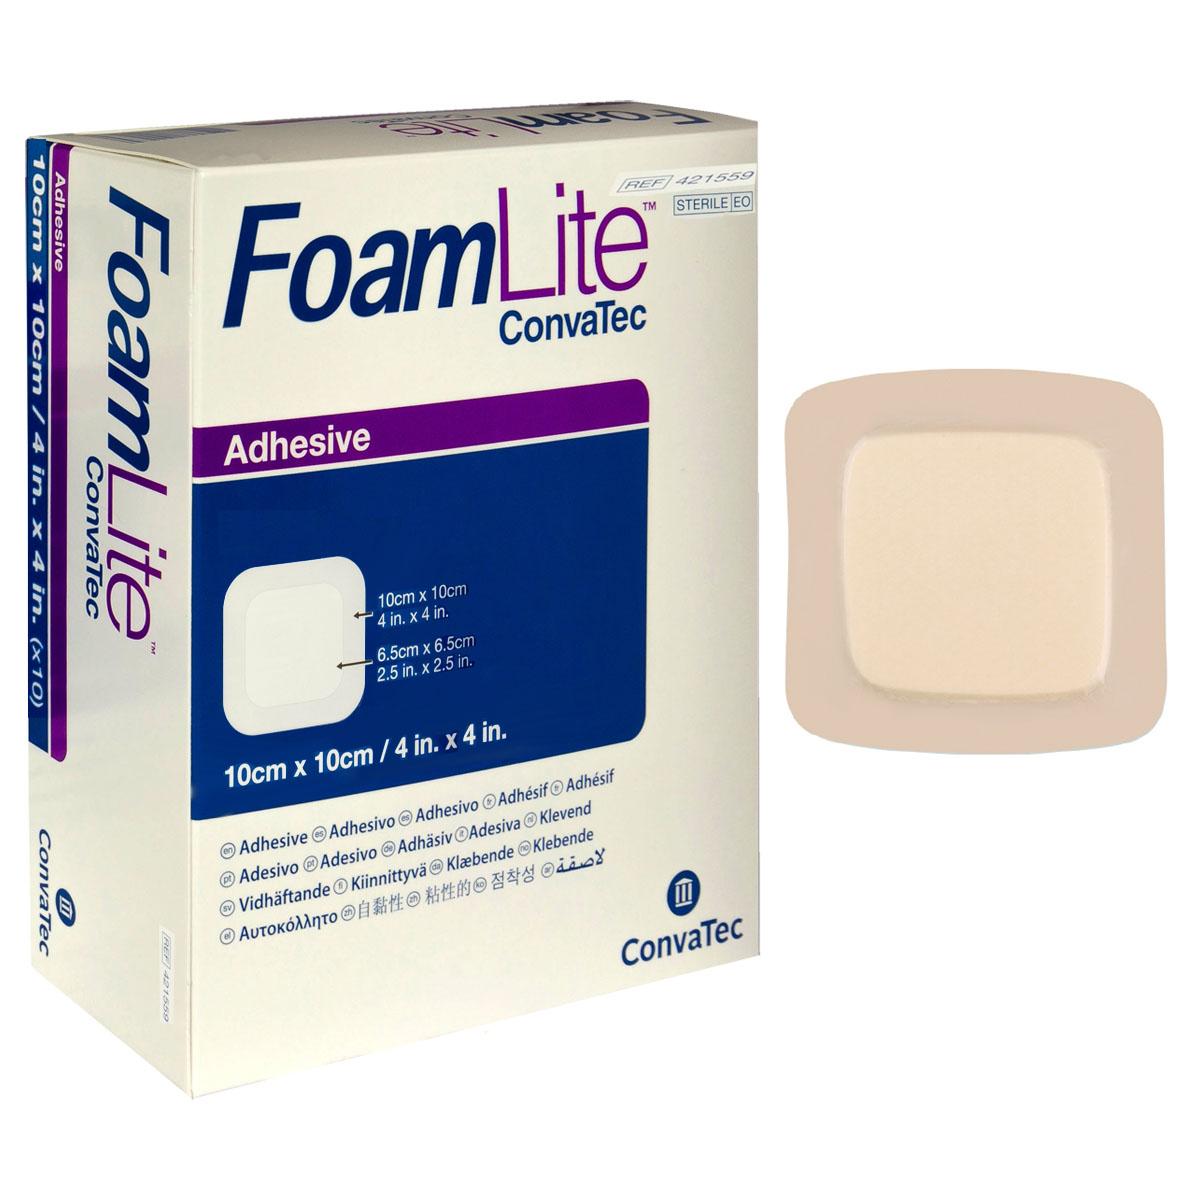 "FoamLite Foam Adhesive Dressing, Square, 4"""" x 4"""" 51421559"